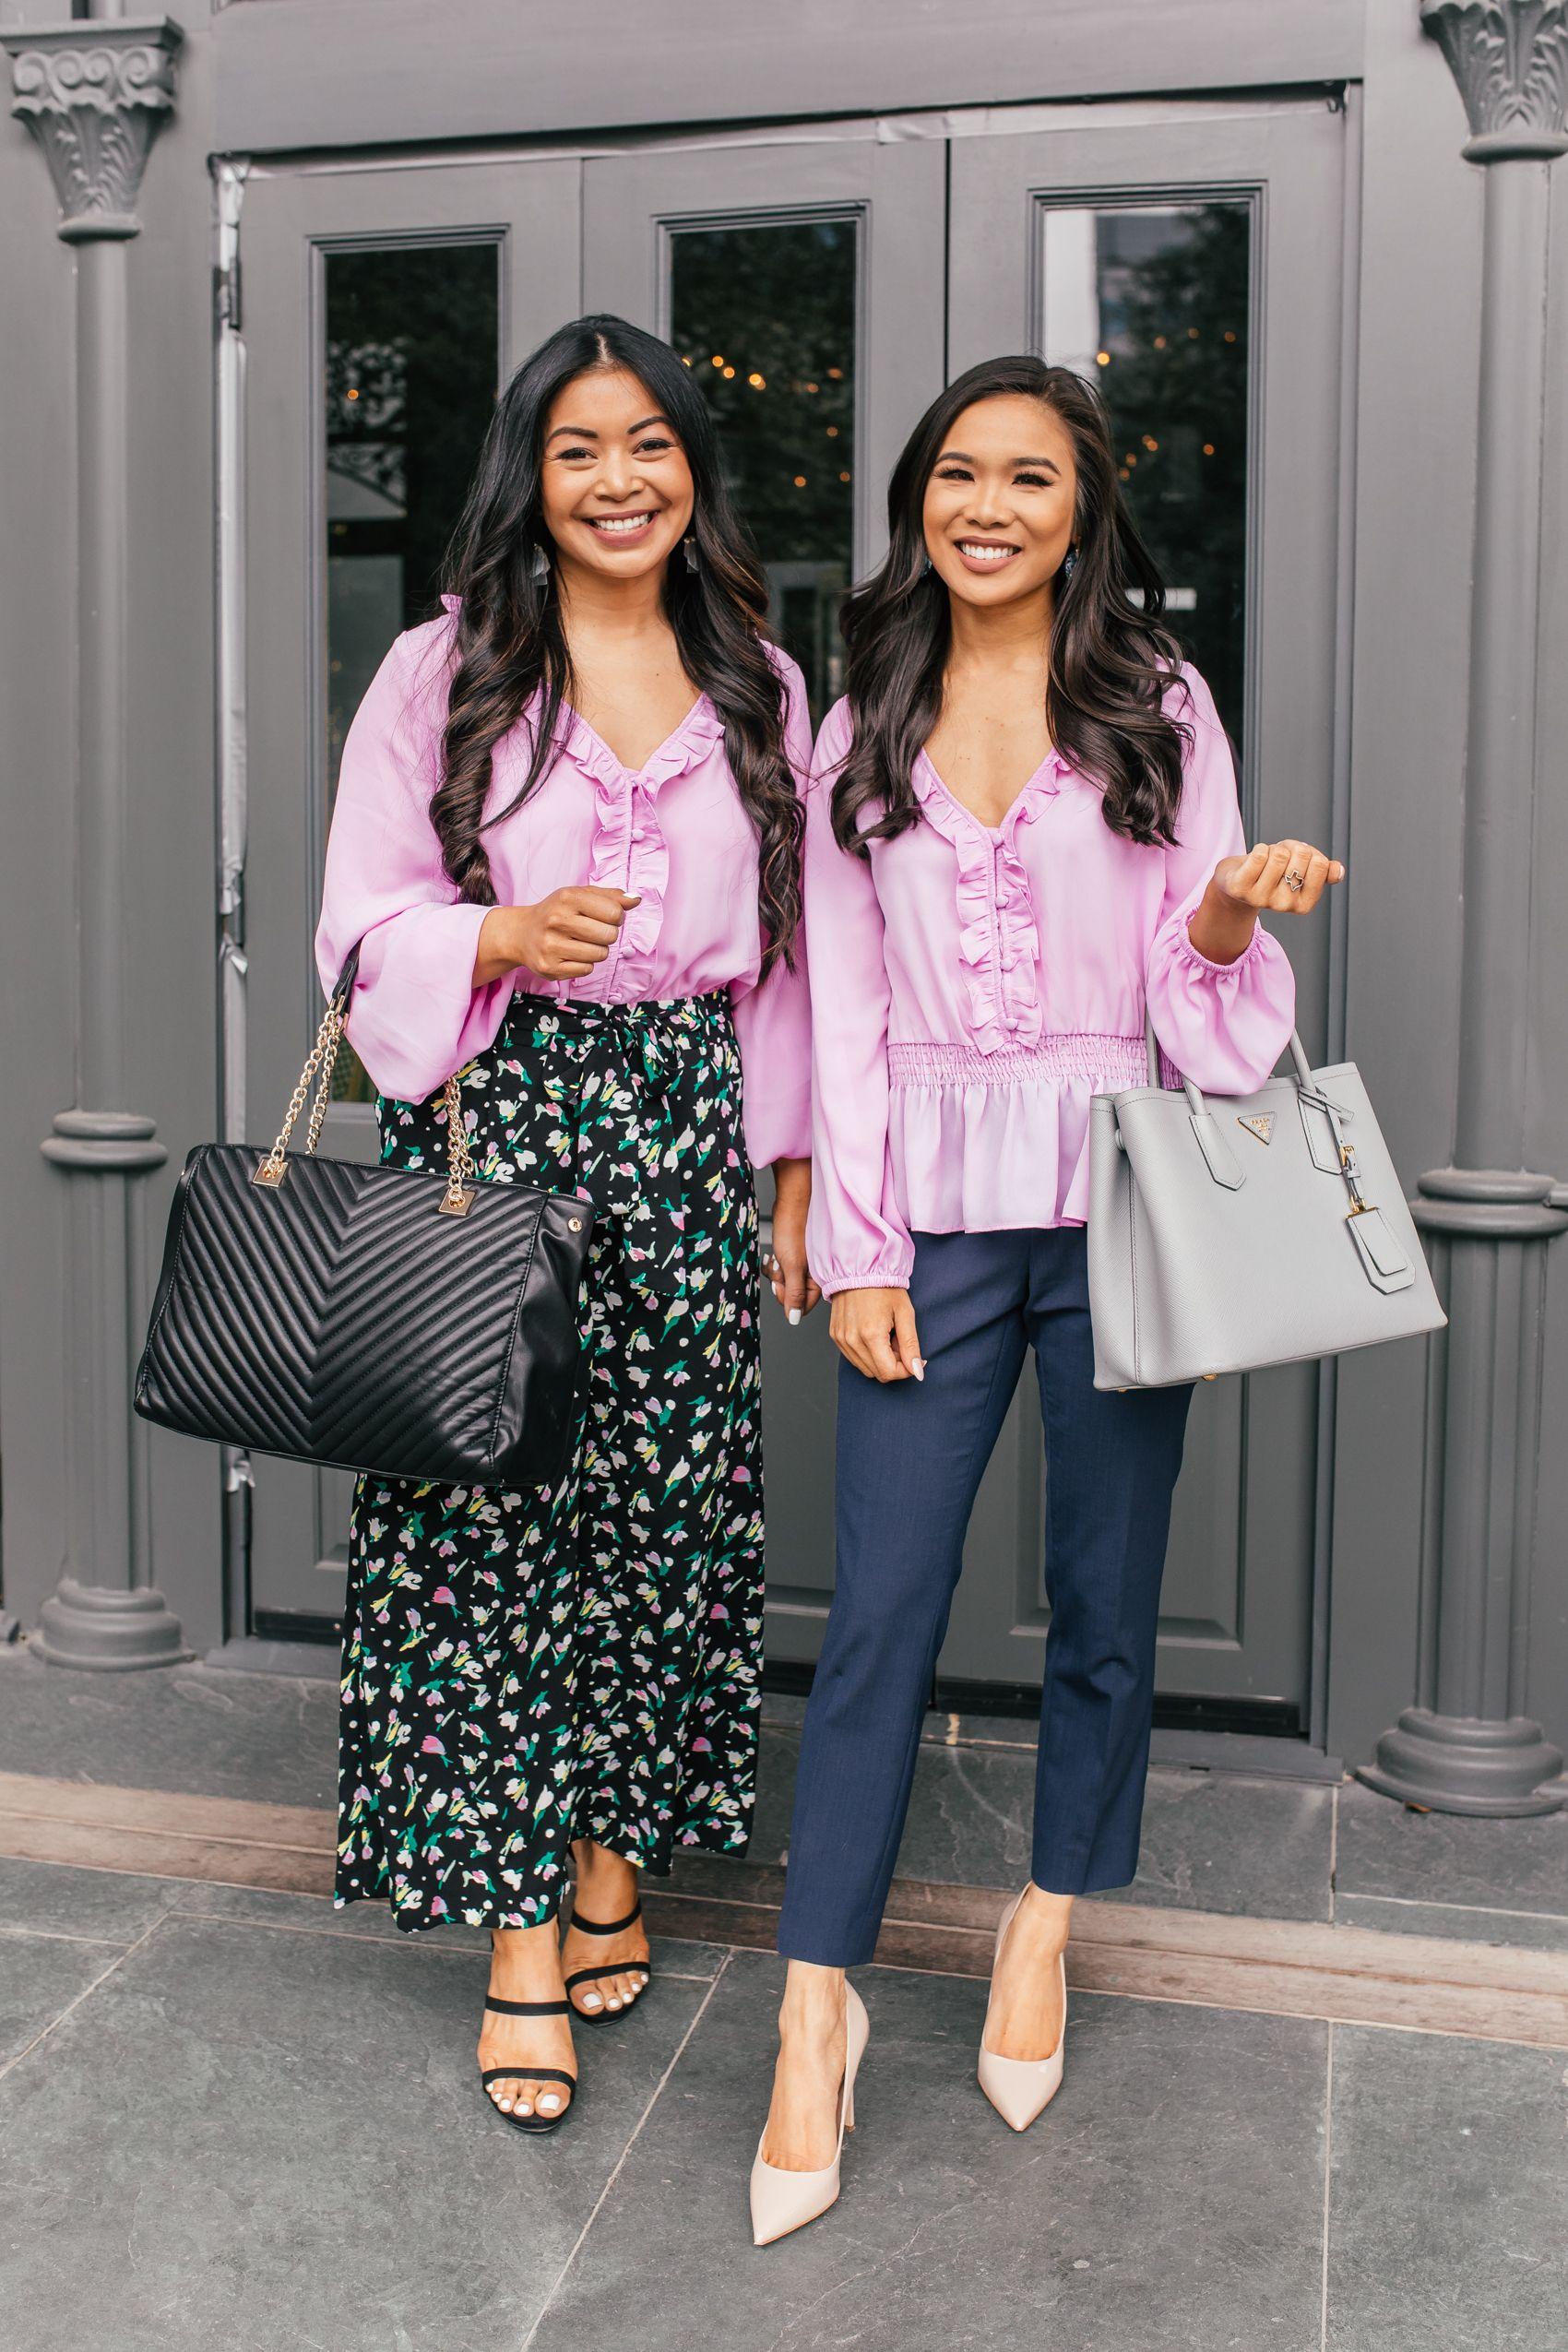 Roselyn and Hoang-Kim style the Roselyn lavender top two ways   capsule wardrobe capsule